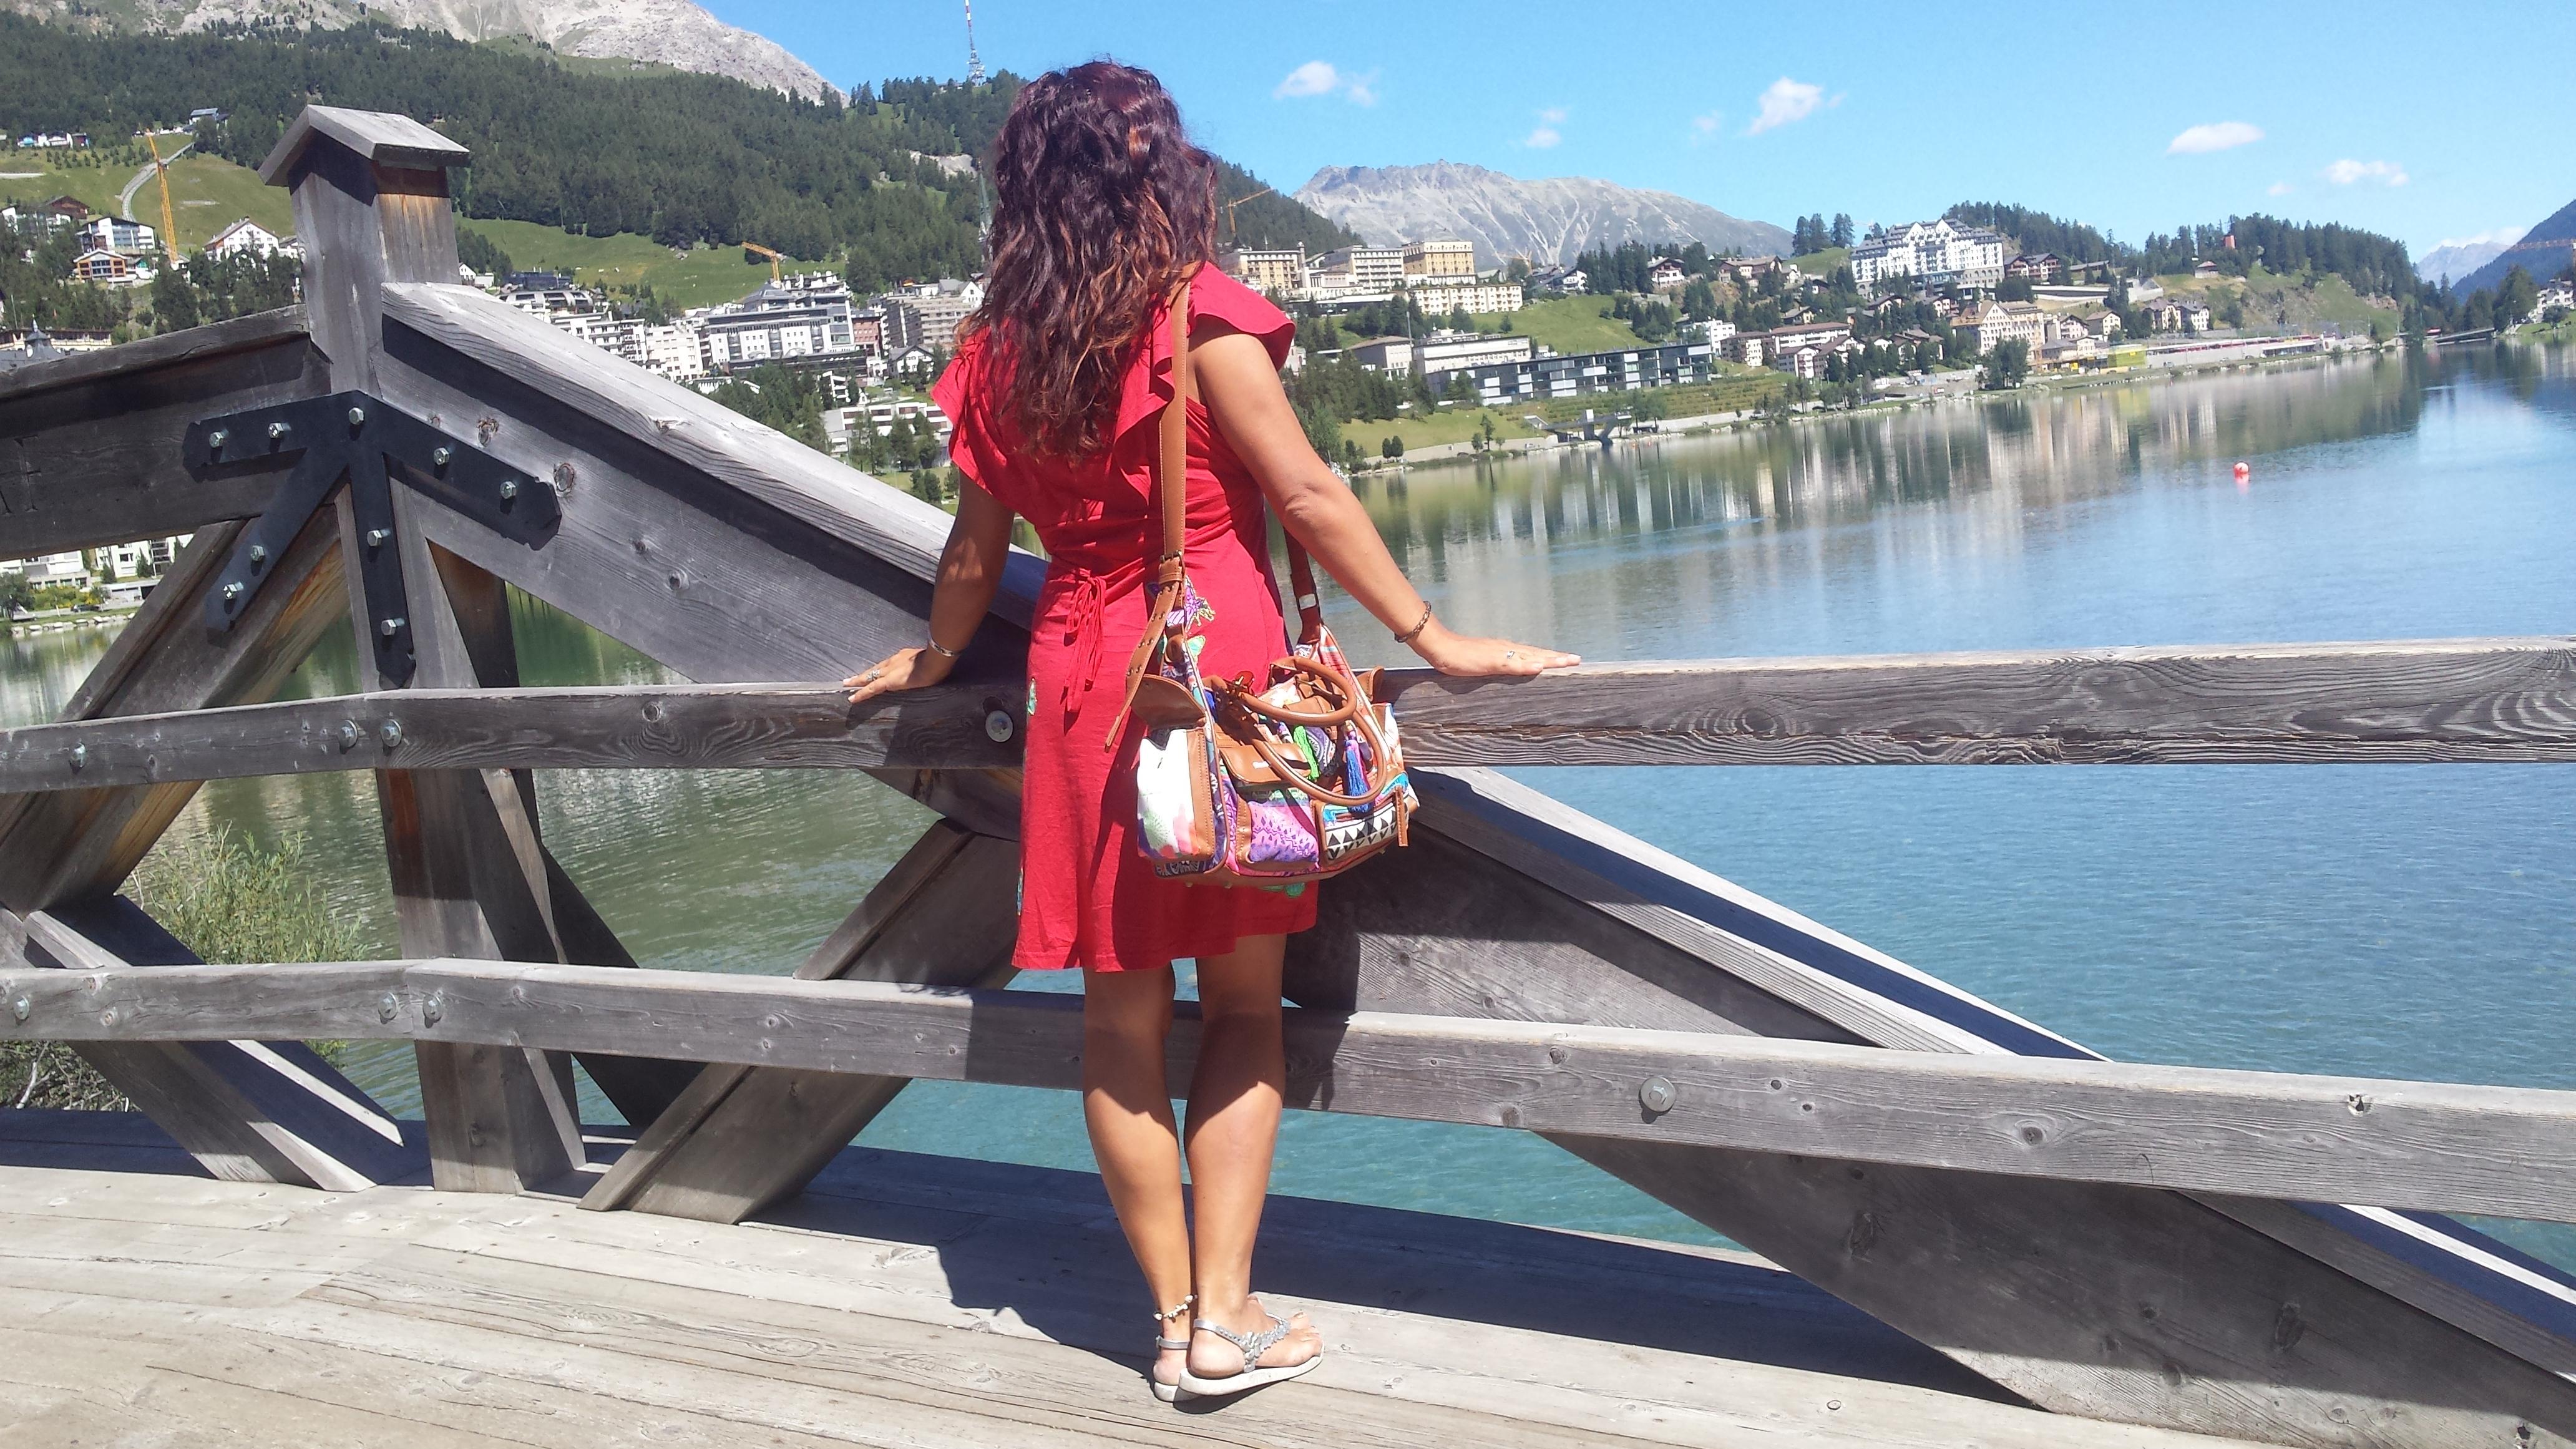 St. Moritz, frumusetea elvetiana pe care as inspira-o zi de zi